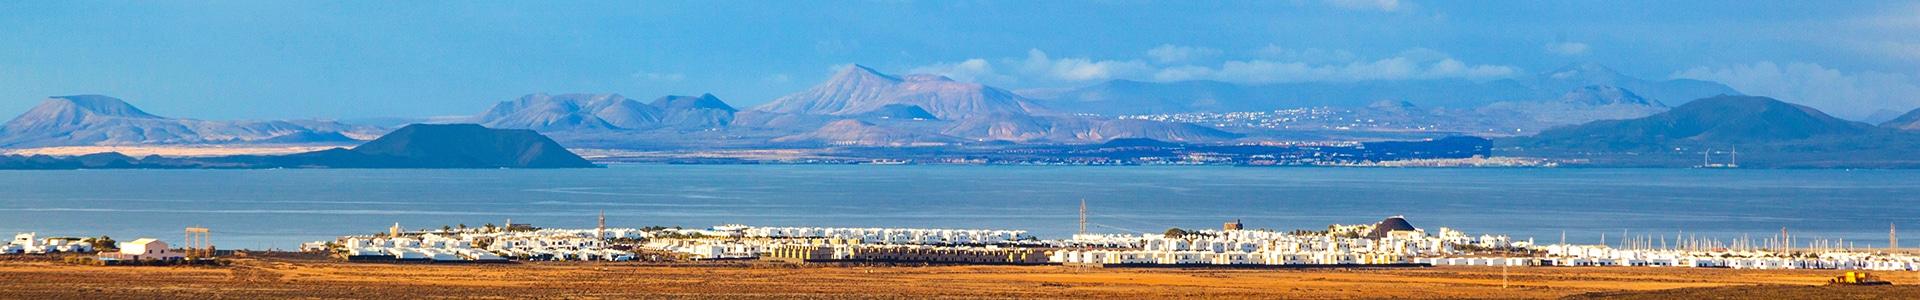 Voyage à Playa Blanca